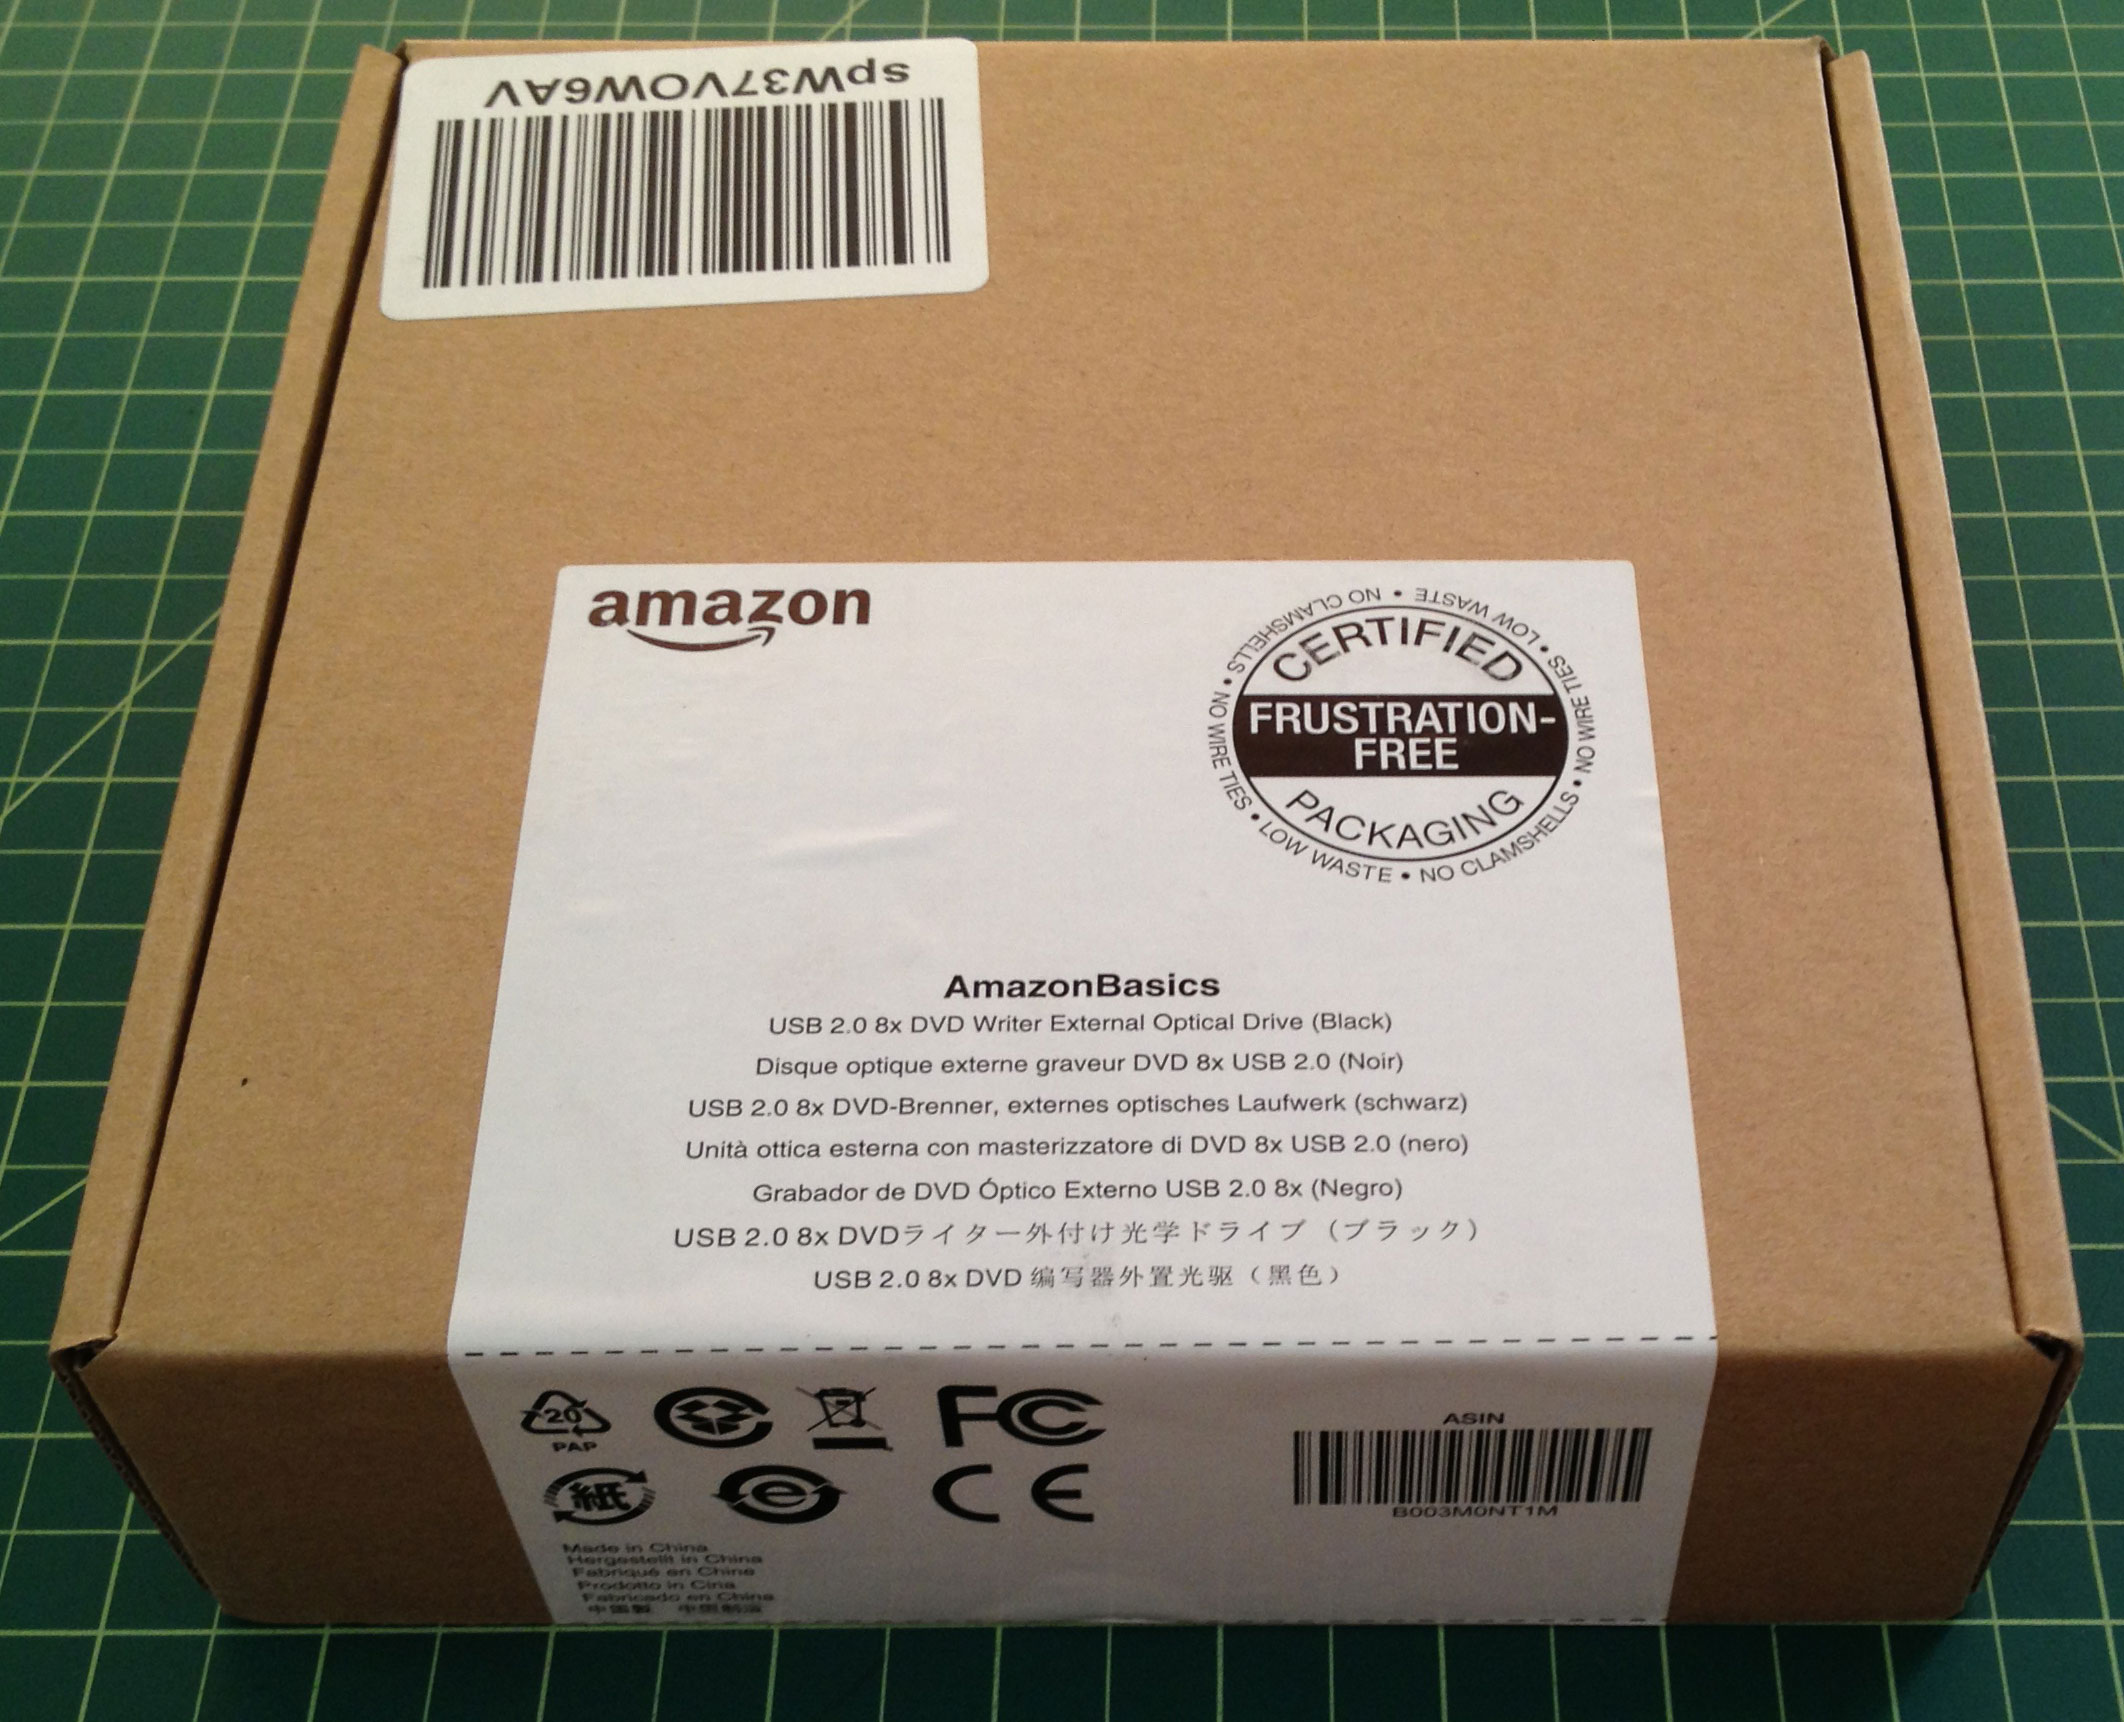 AmazonBasicsDVDPackage.jpg